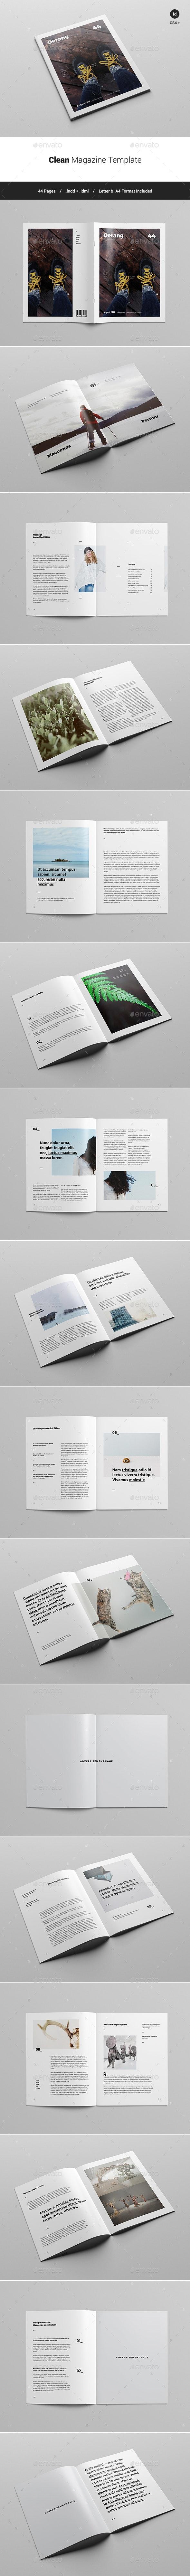 Clean Magazine Template - Magazines Print Templates